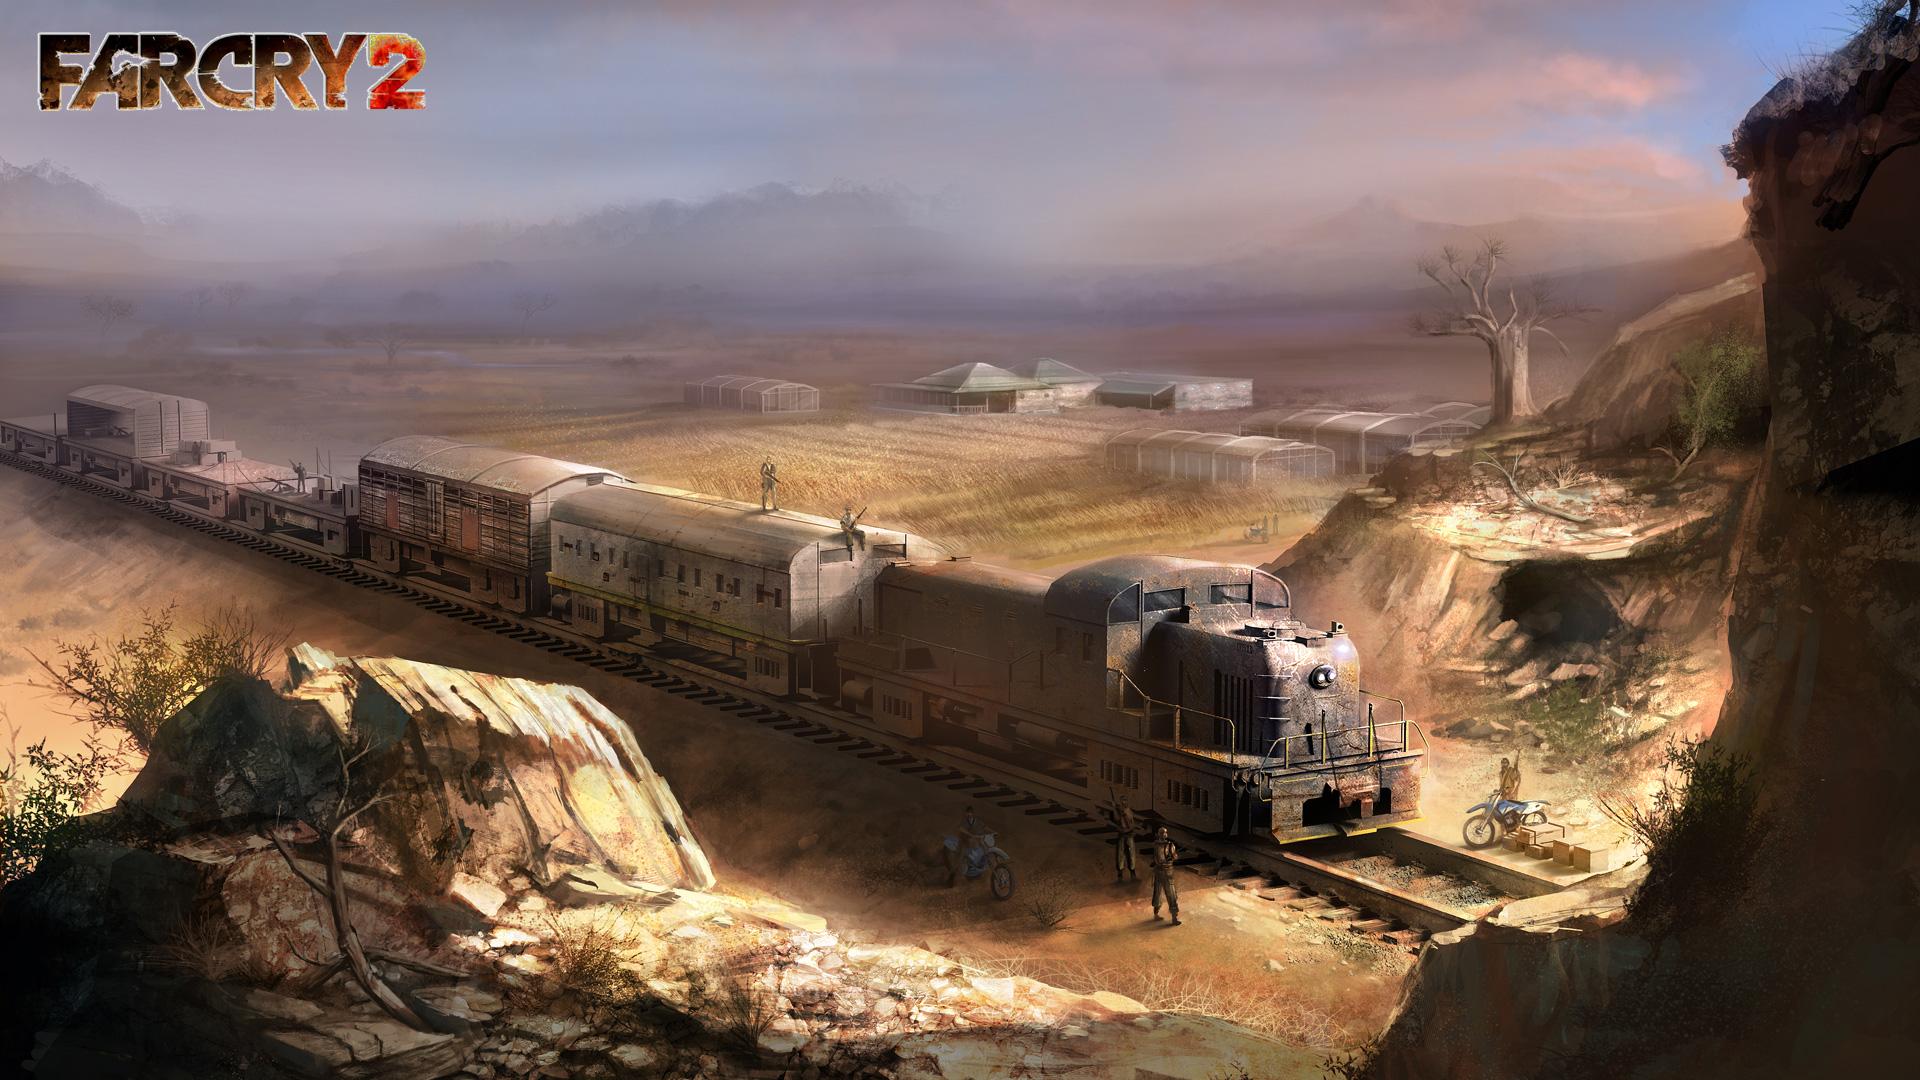 Free Far Cry 2 Wallpaper in 1920x1080